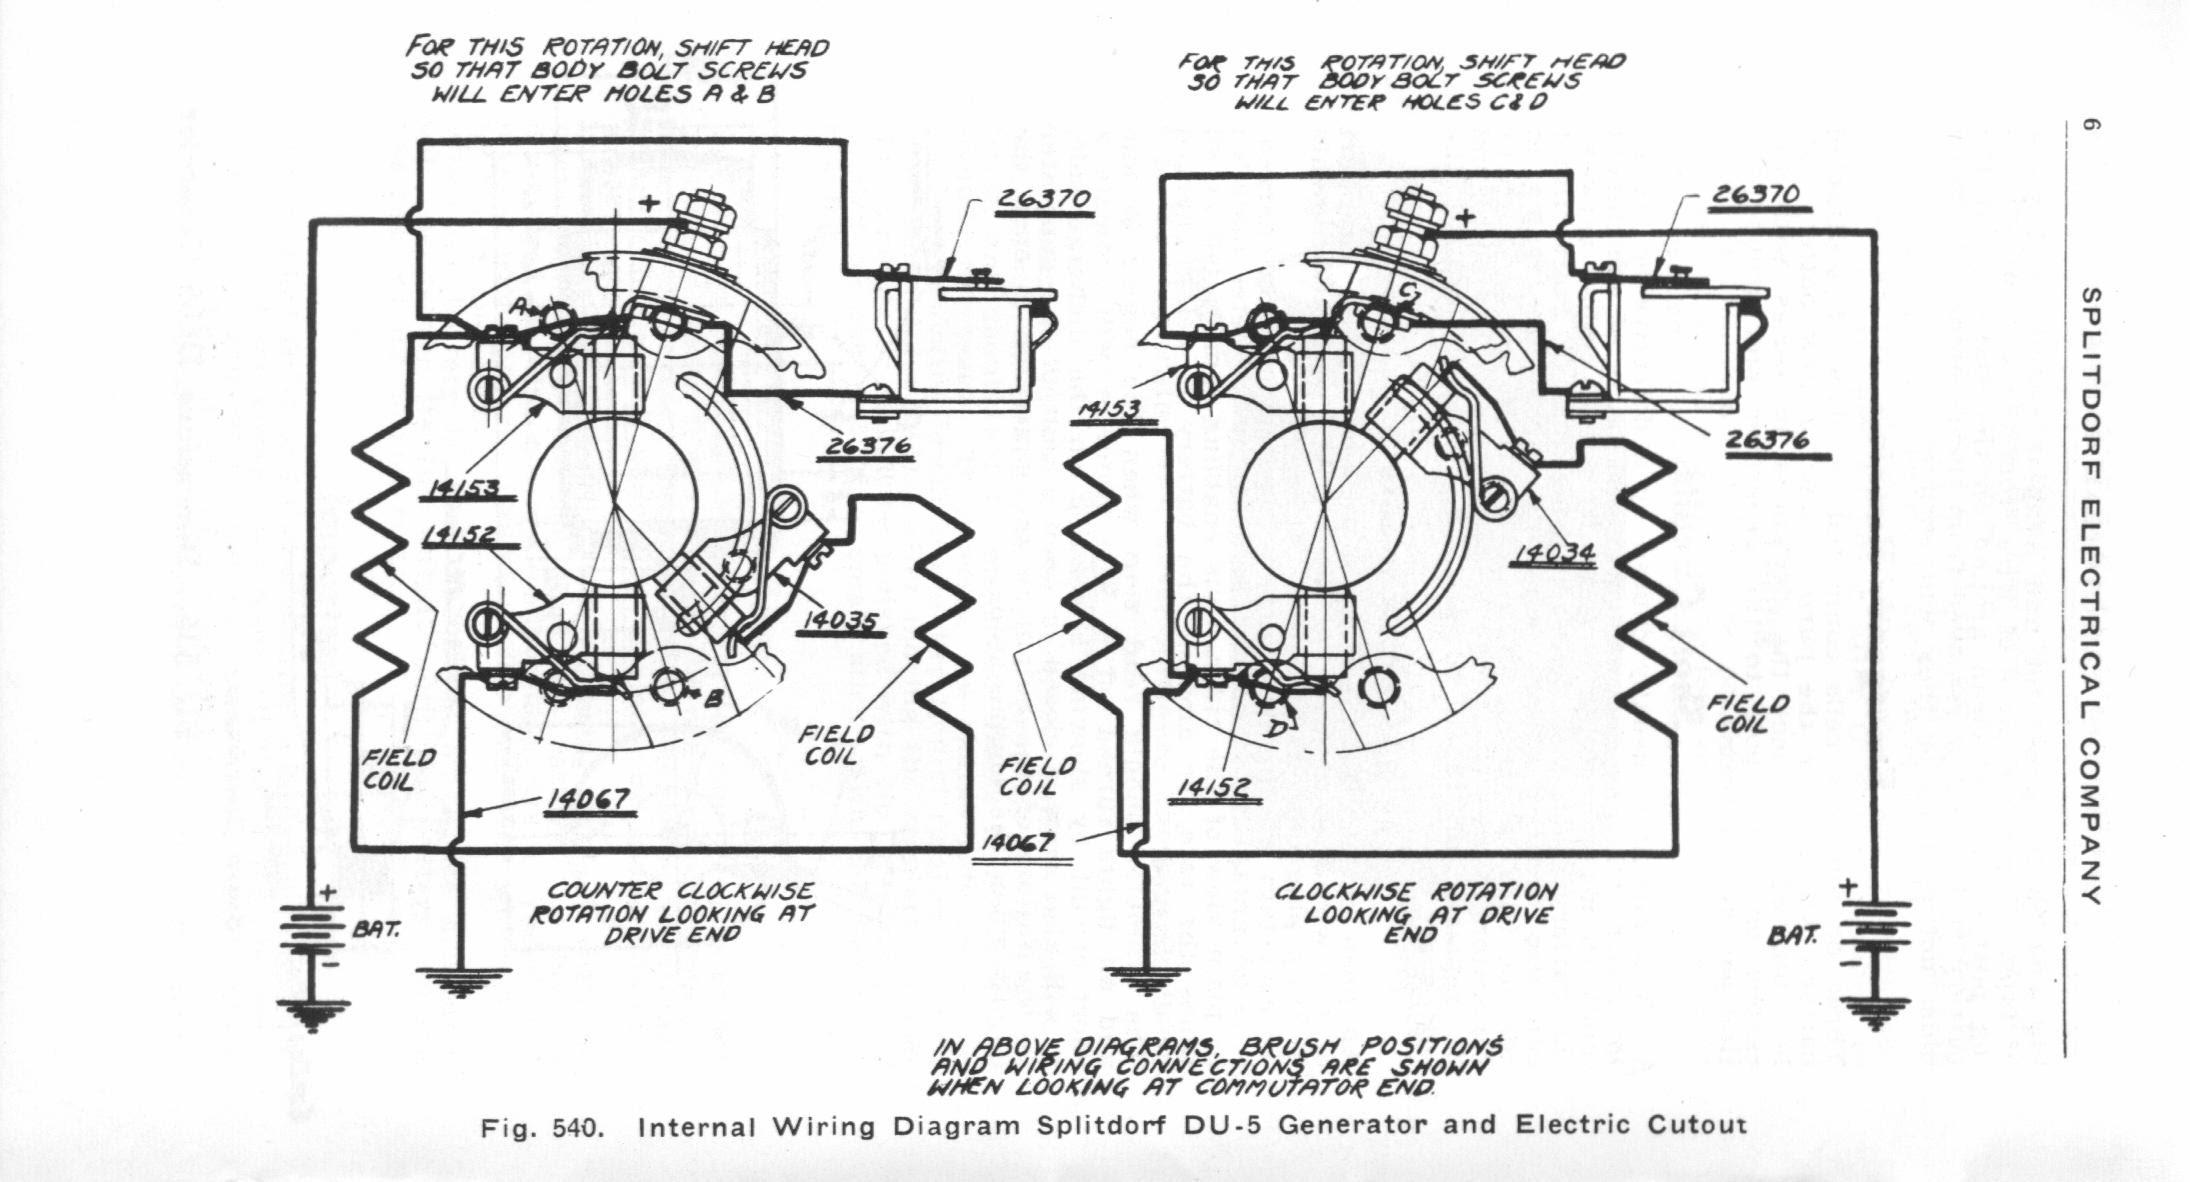 [DIAGRAM] 2008 Polaris Outlaw 525 Wiring Diagram FULL